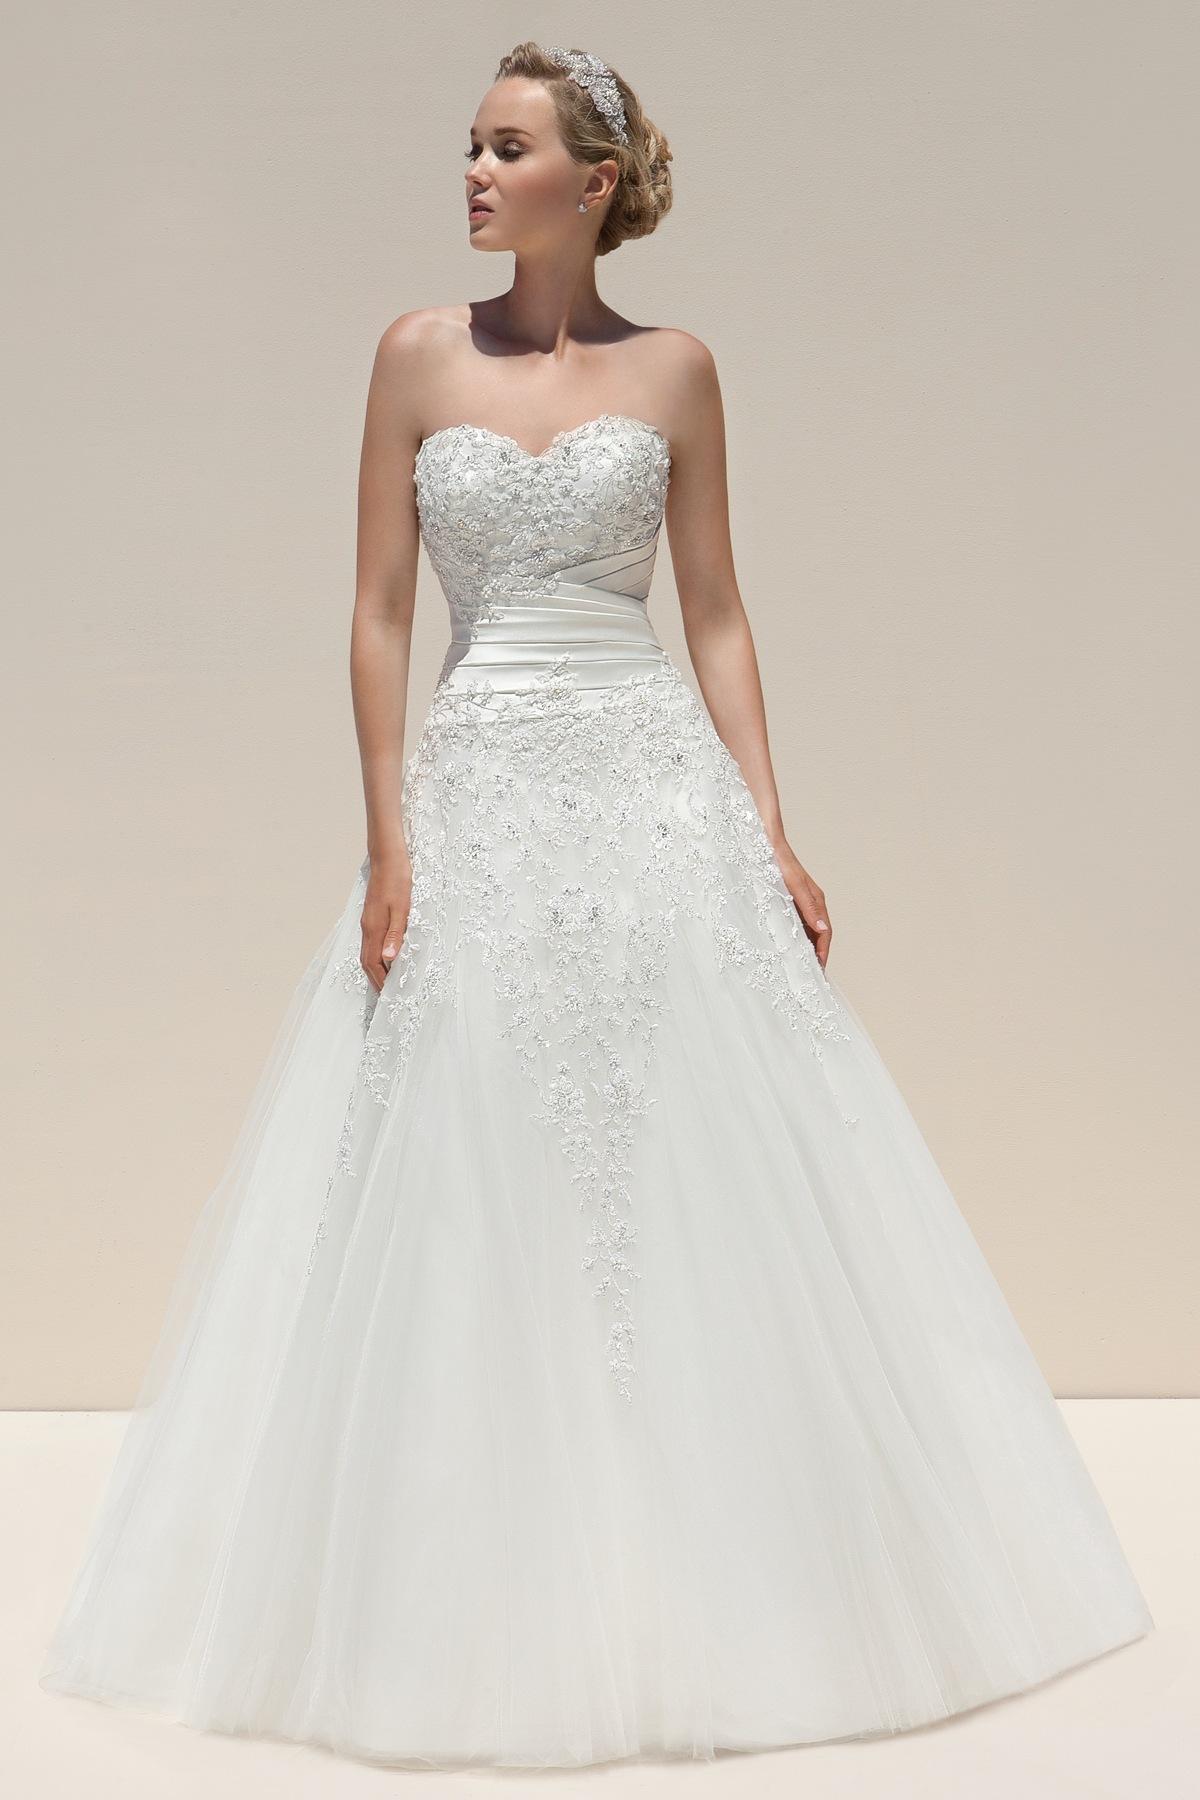 Mark Lesley 7073 Bridal Gown Mia Sposa Bridal Boutique